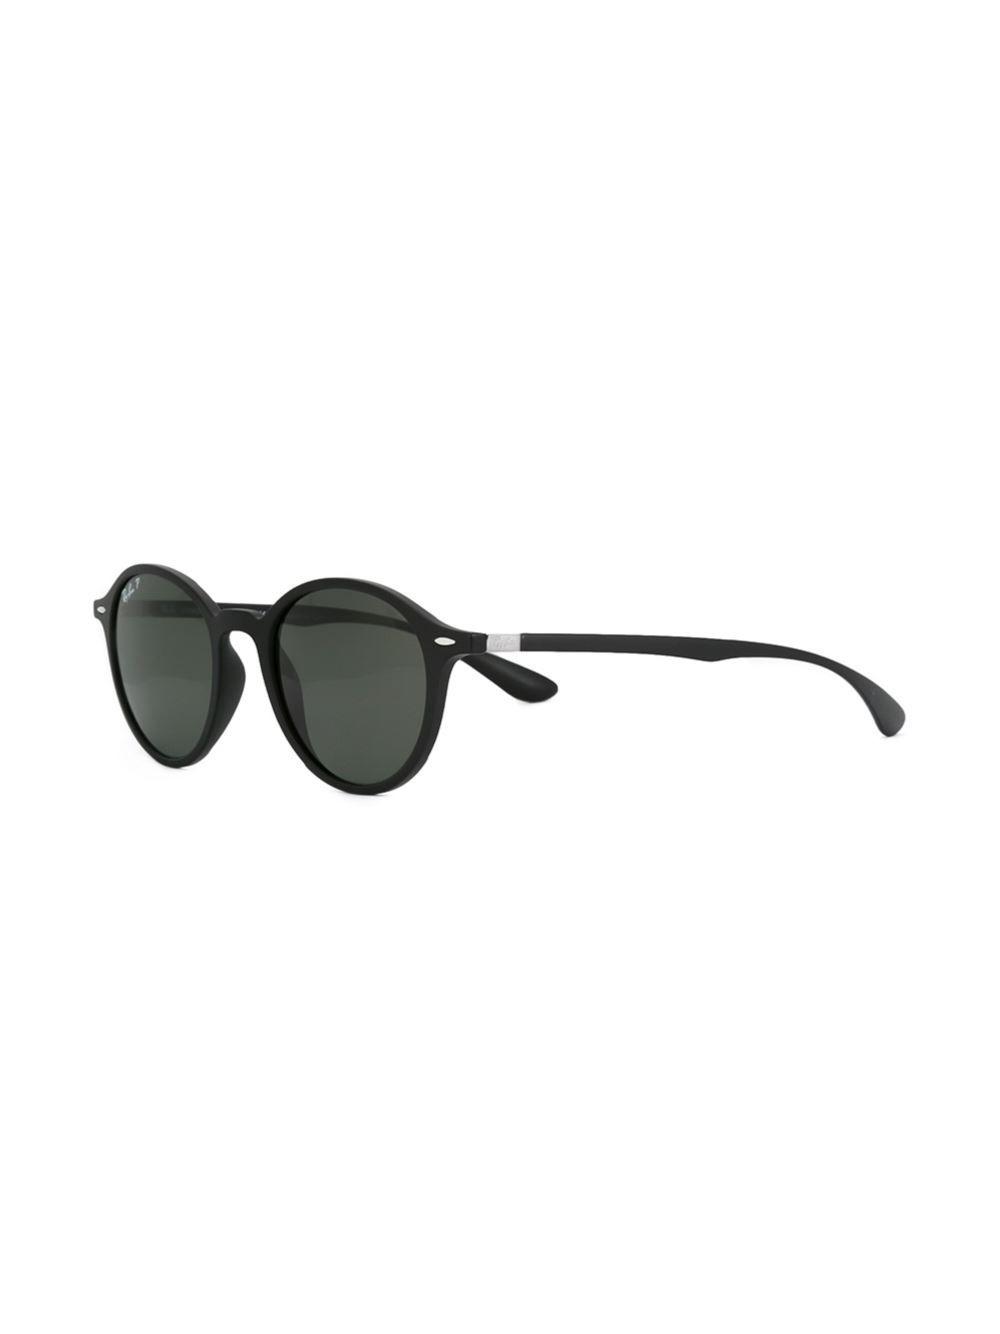 c549c9ea162 Ray-Ban  Round Liteforce  sunglasses